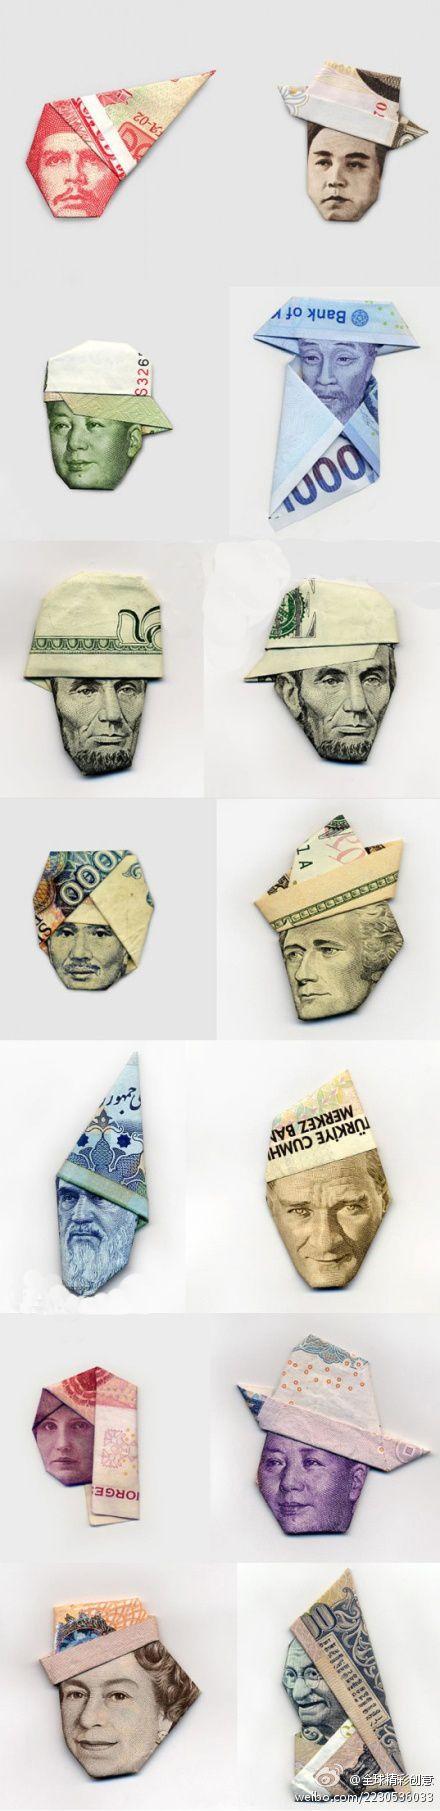 .: Parties Hats, Funny Hats, Money Crafts, Money Gifts, Money Origami, Money Art, Folding Money, Money Maker, Diy